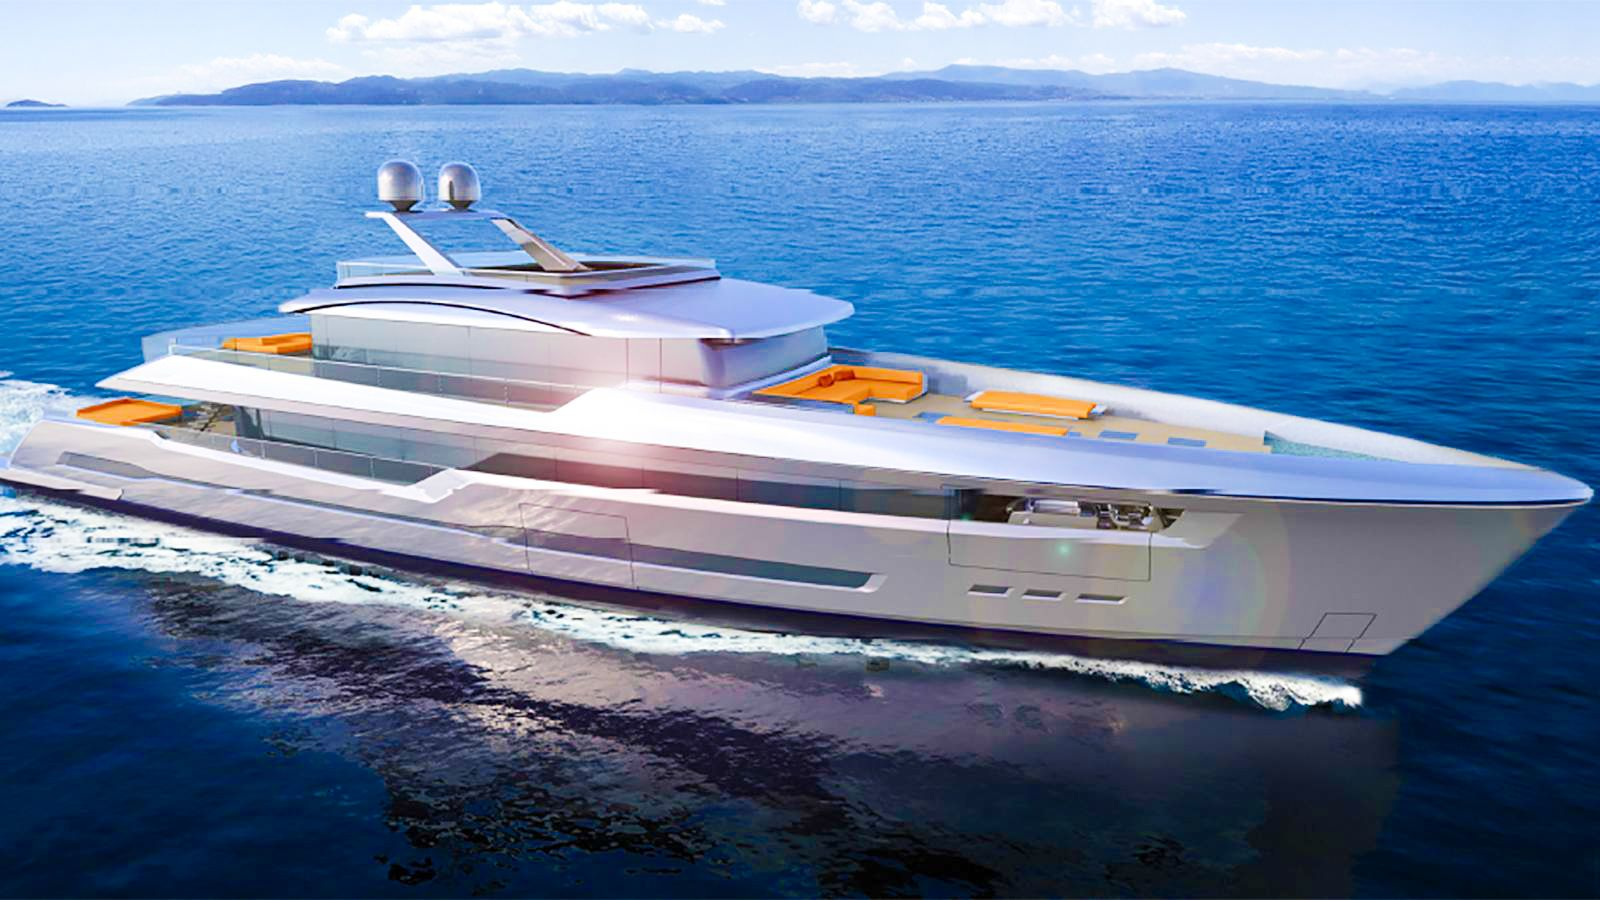 Superyacht Design Symposium Young Designer Of The Year Award Contestant:  BEN HILLS